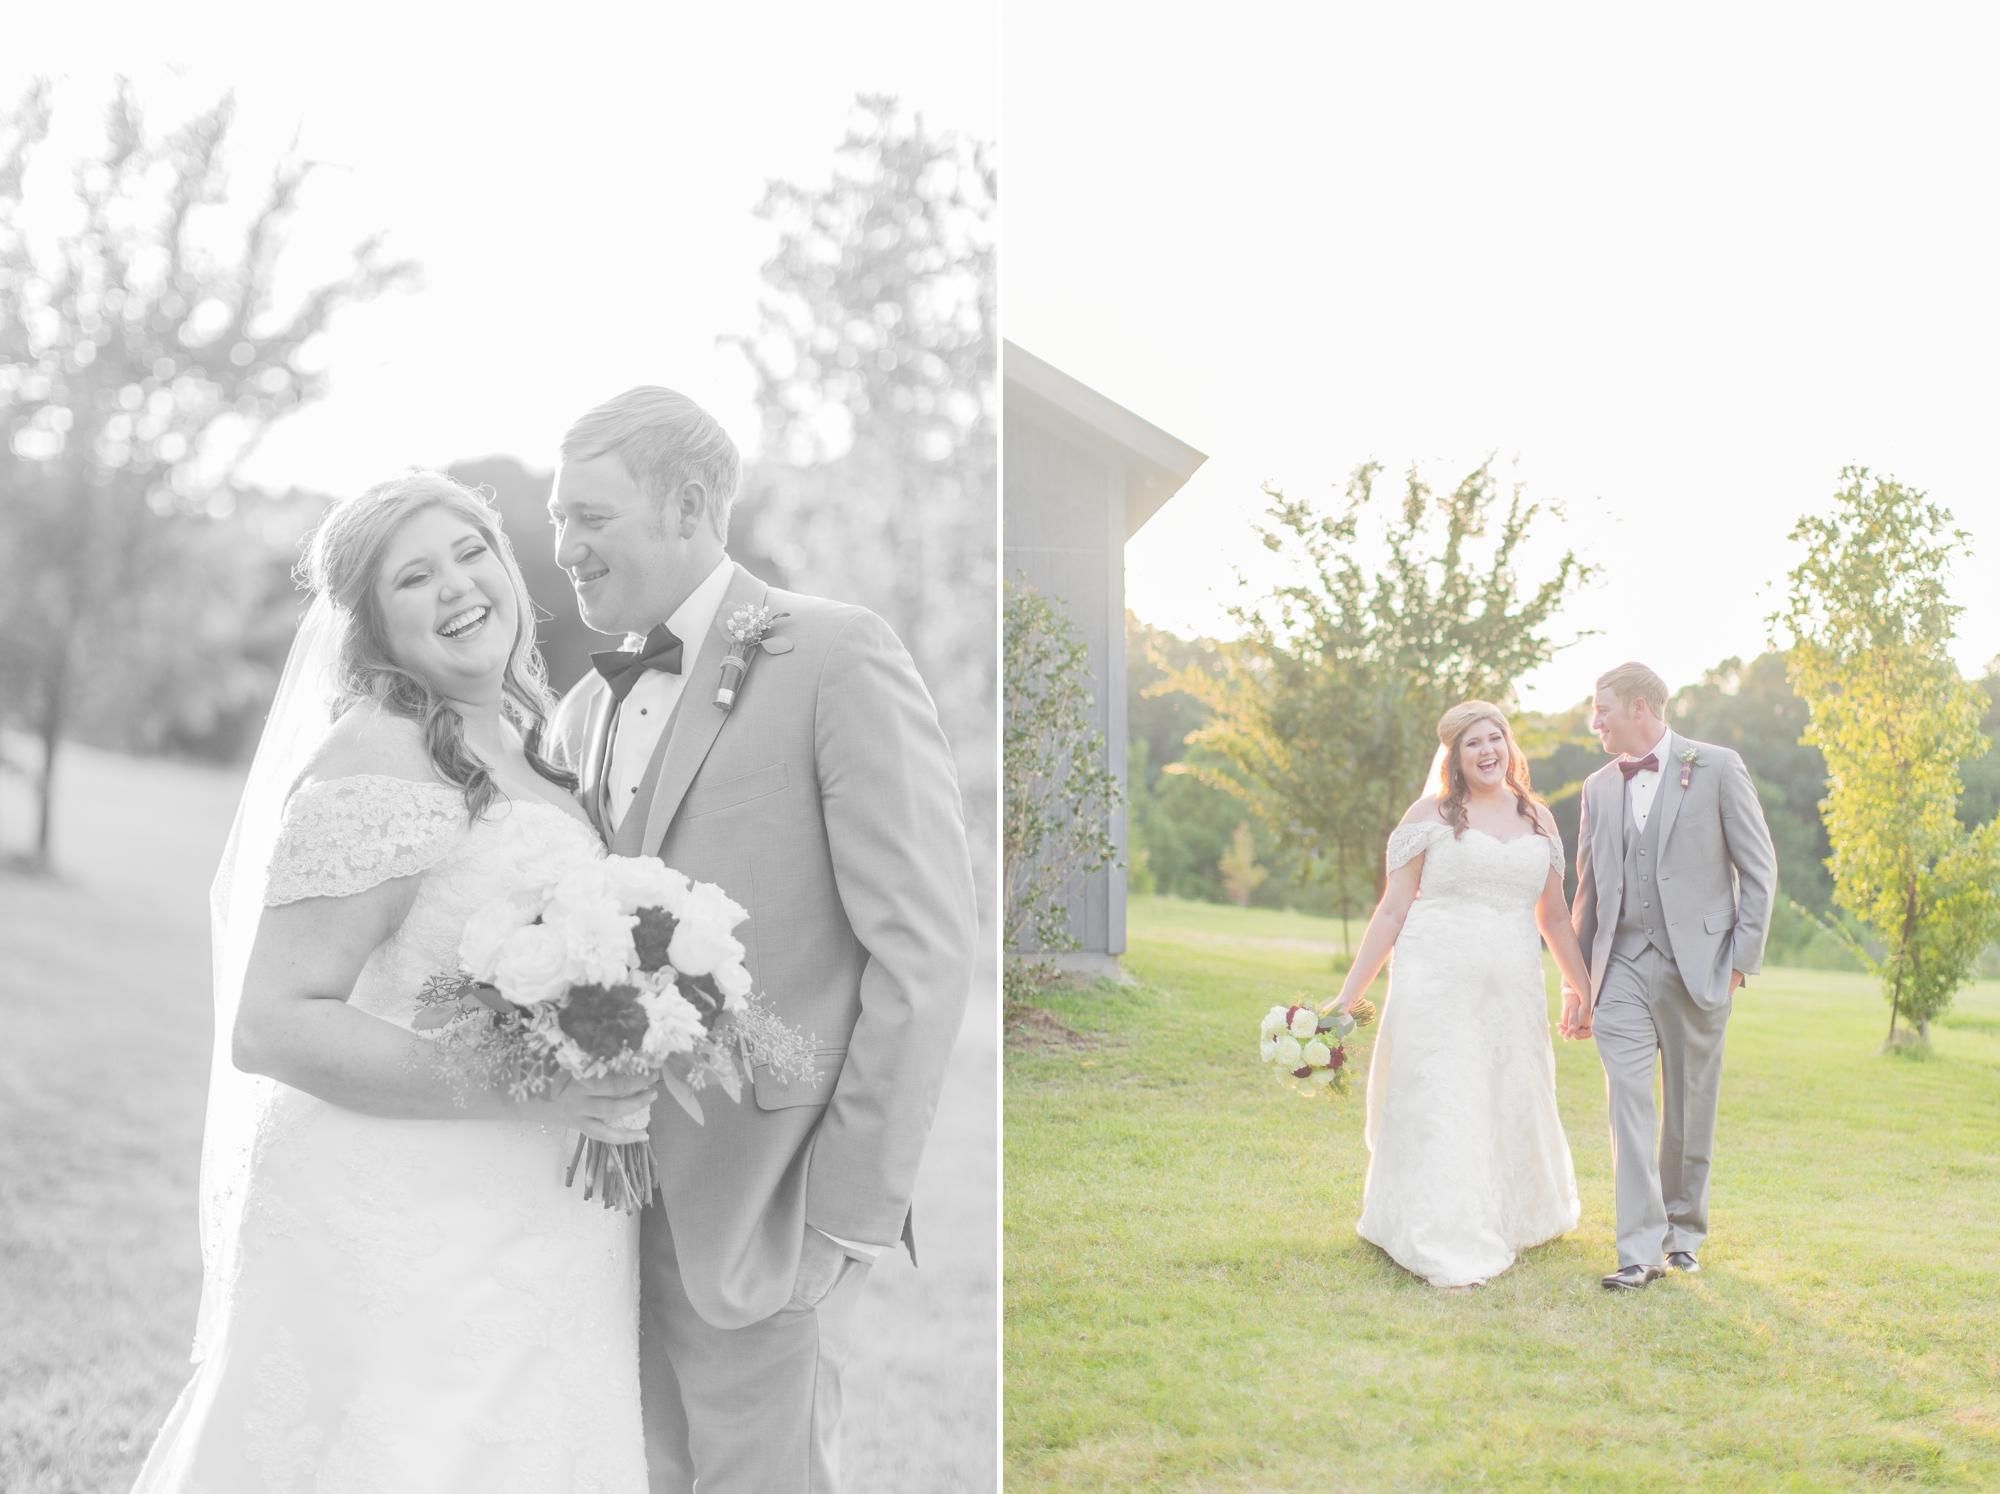 brandon-mississippi-fall-wedding 55.jpg